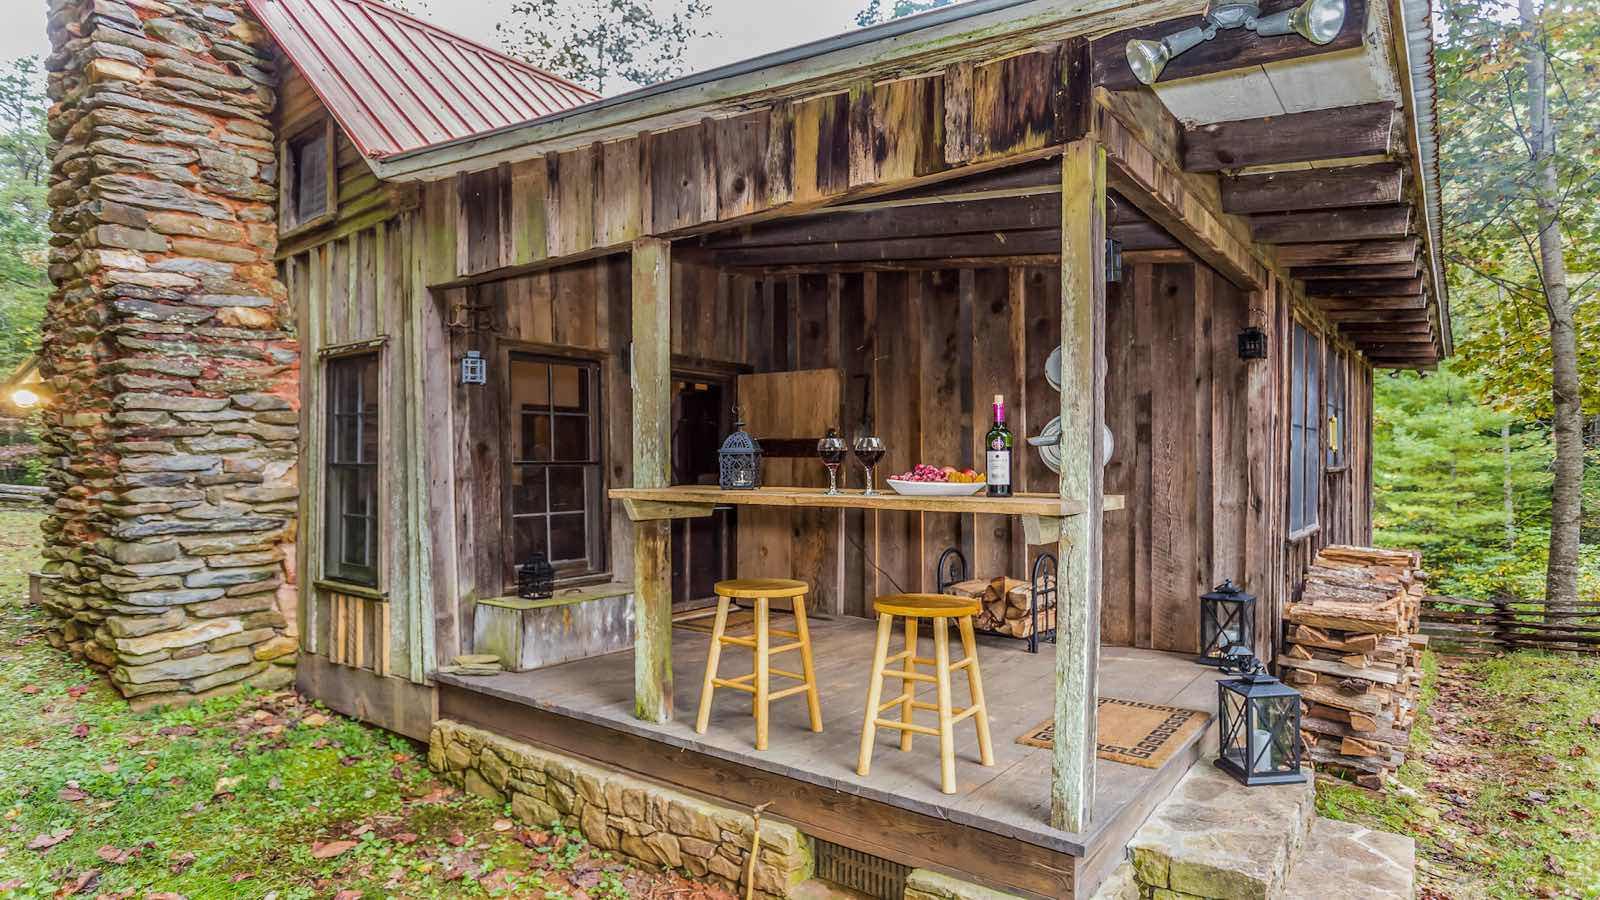 Back Porch Cabin : My blue ridge travel guide